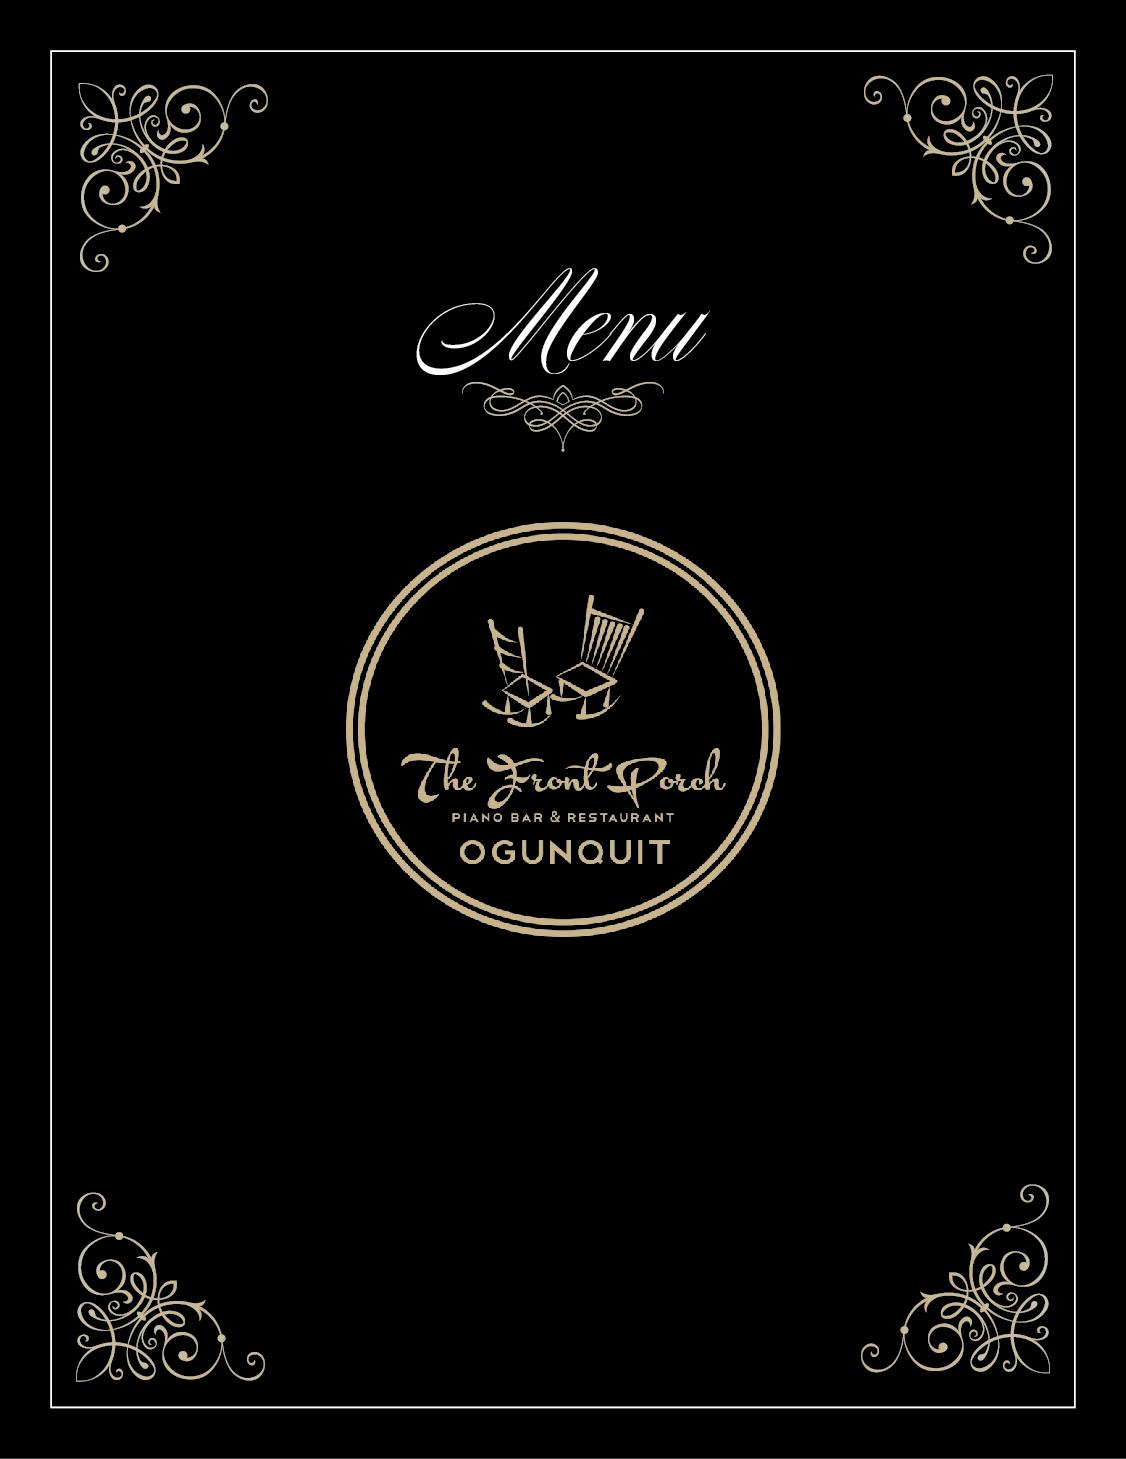 Elegante Jugueton Restaurant Diseno De Menu For Wescott Enterprises Llc Por Raywind Diseno 6566047